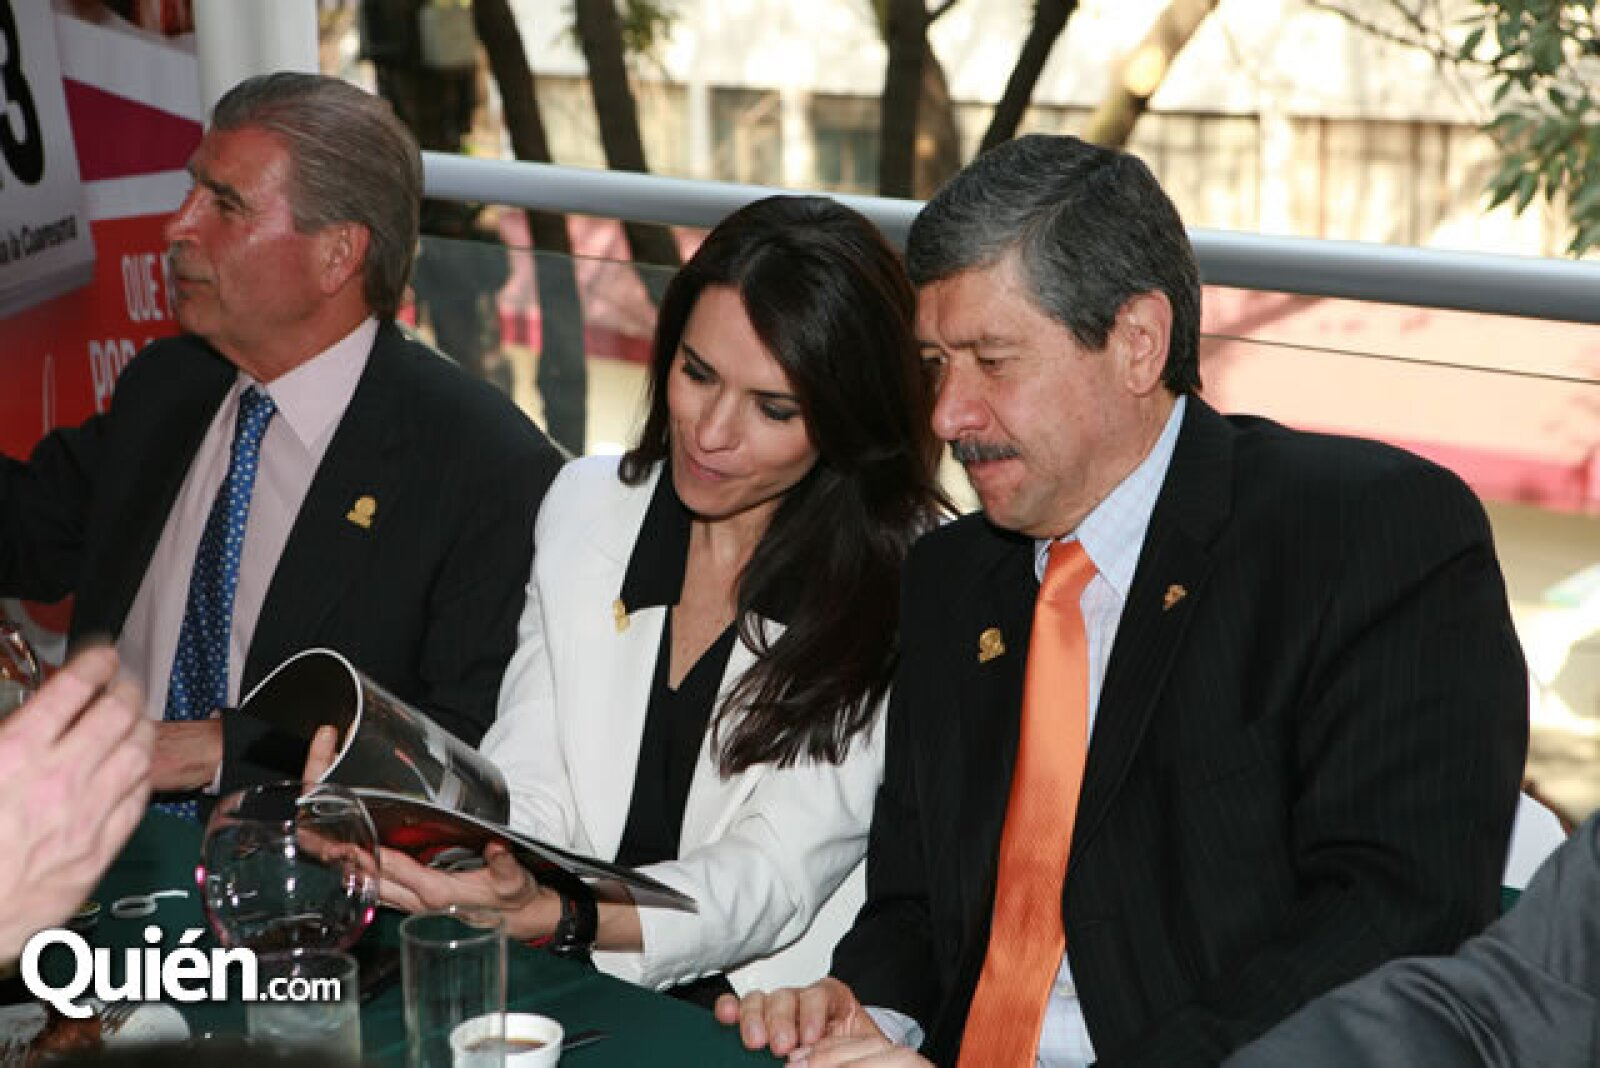 Luis Gálvez, Laura Ortega e Ignacio Tatto